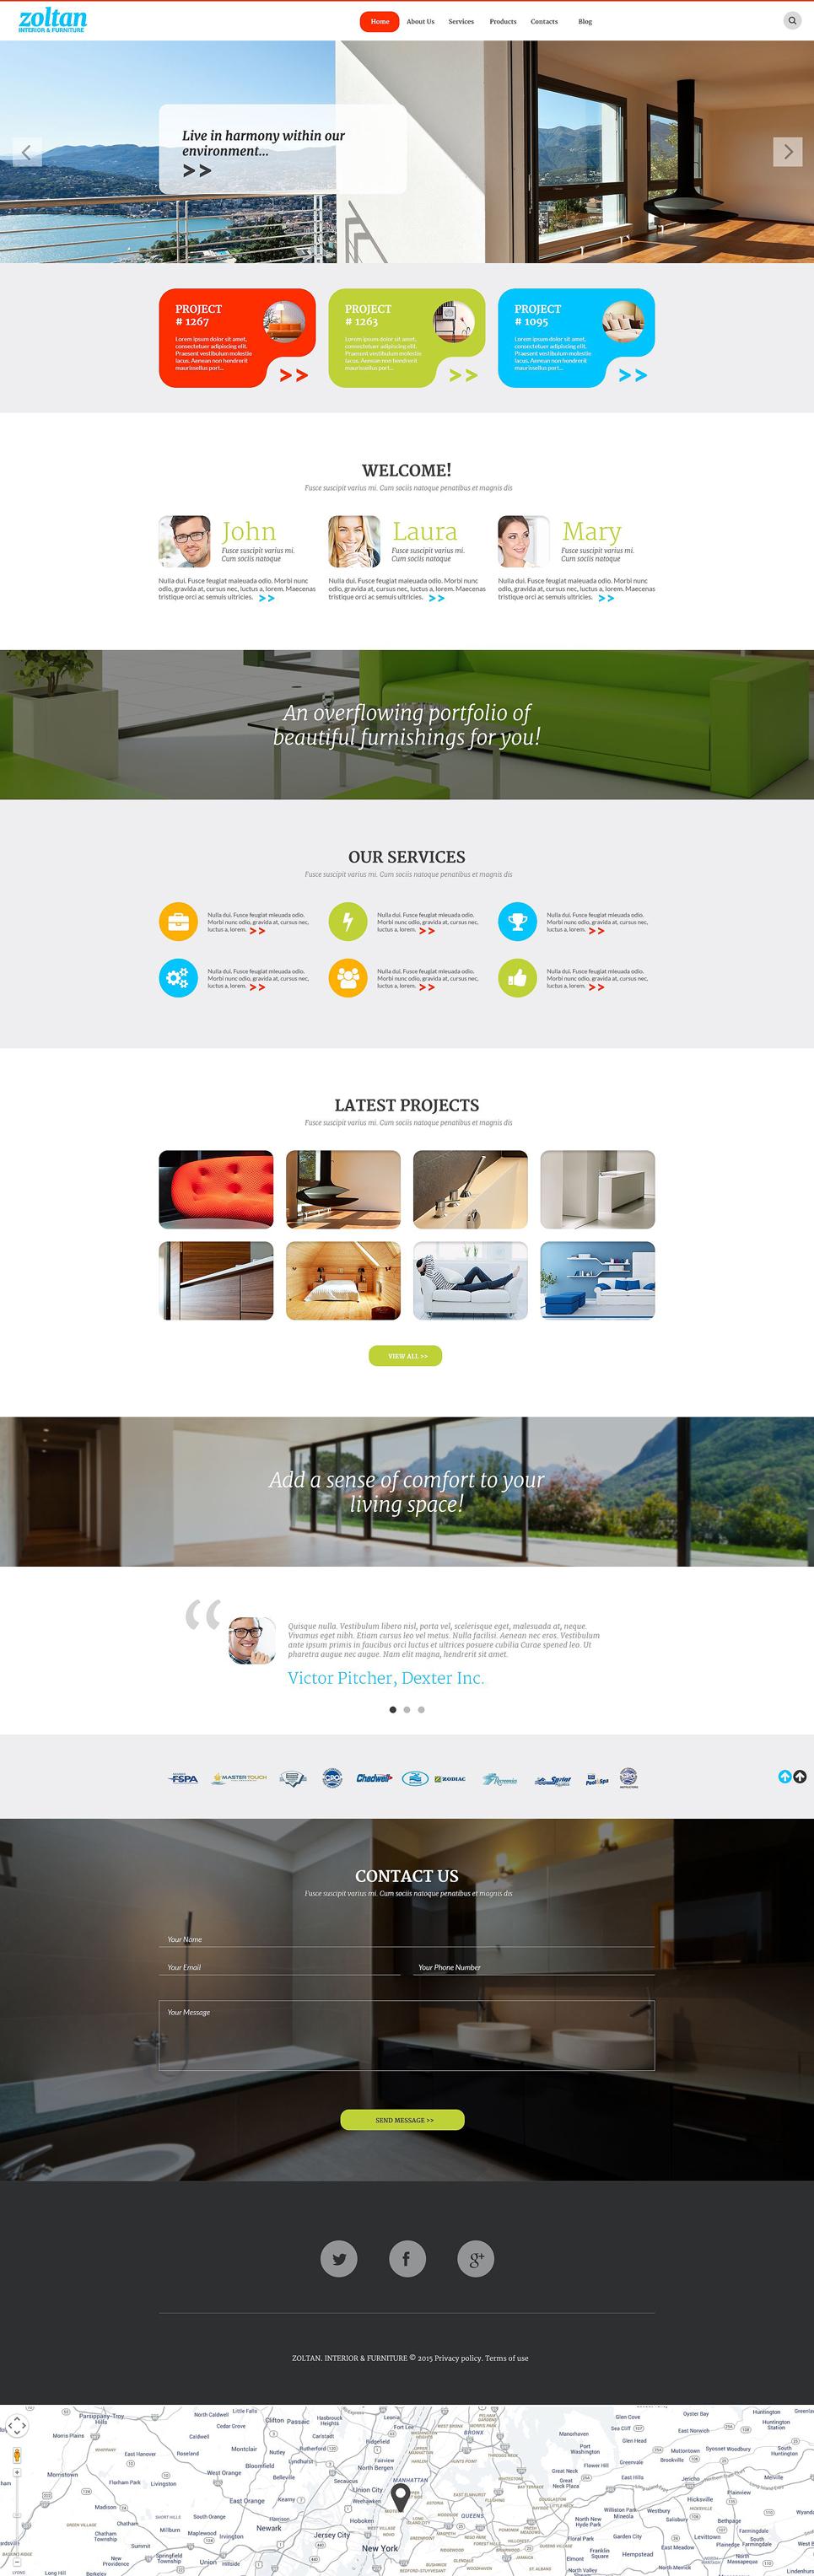 Адаптивный шаблон сайта на тему дизайн и интерьер #54582